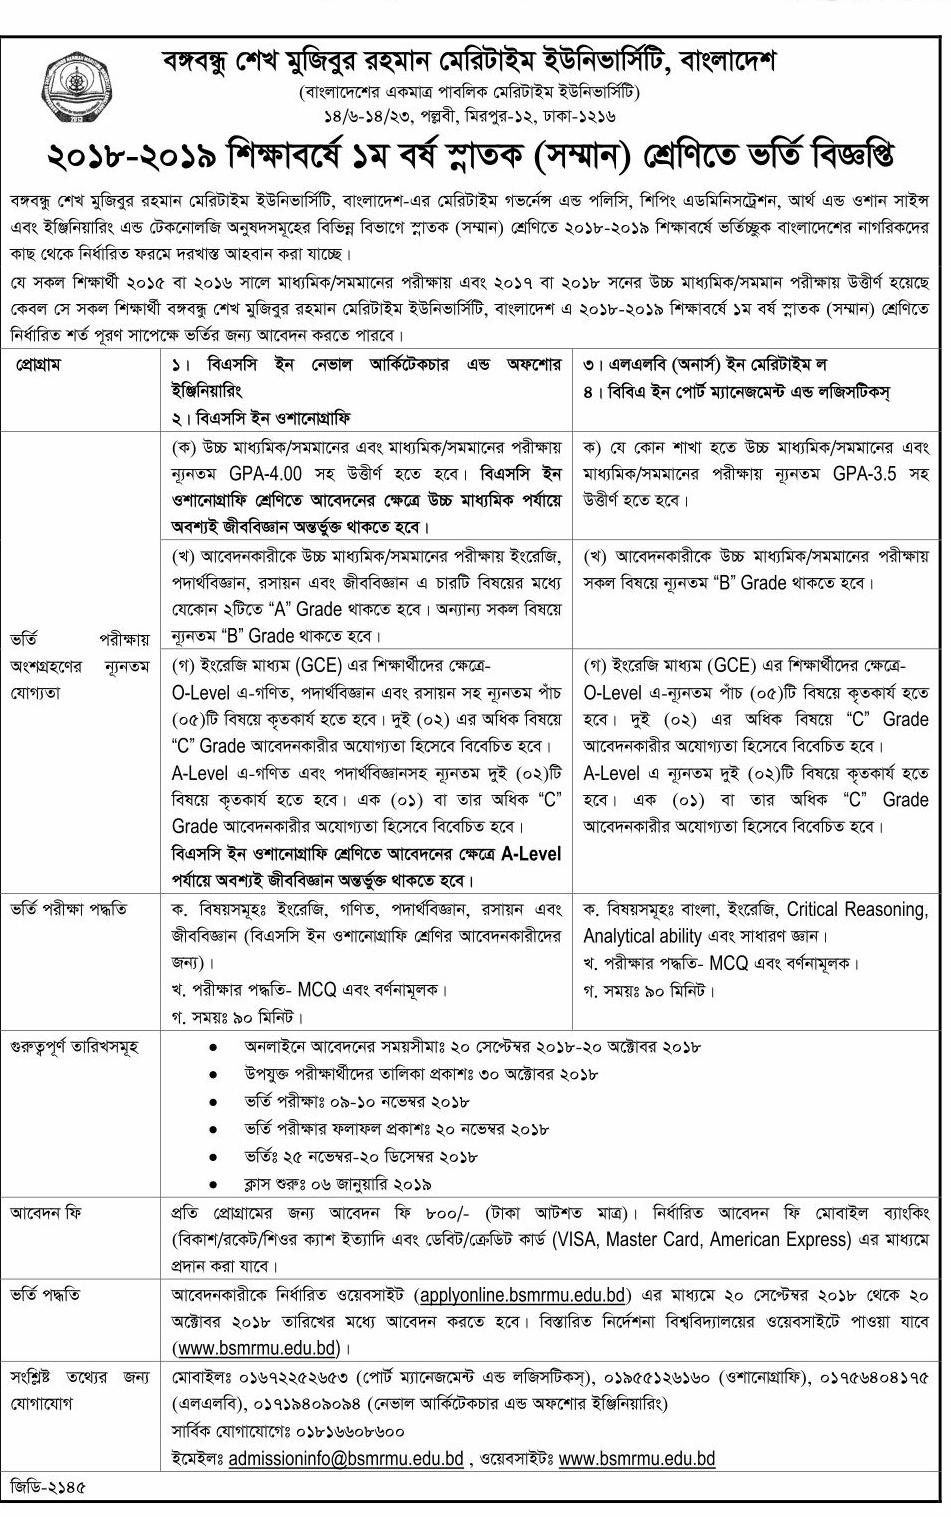 Bangabandhu Sheikh Mujibur Rahman Maritime University (BSMRMU) Admission circular 2018-2019